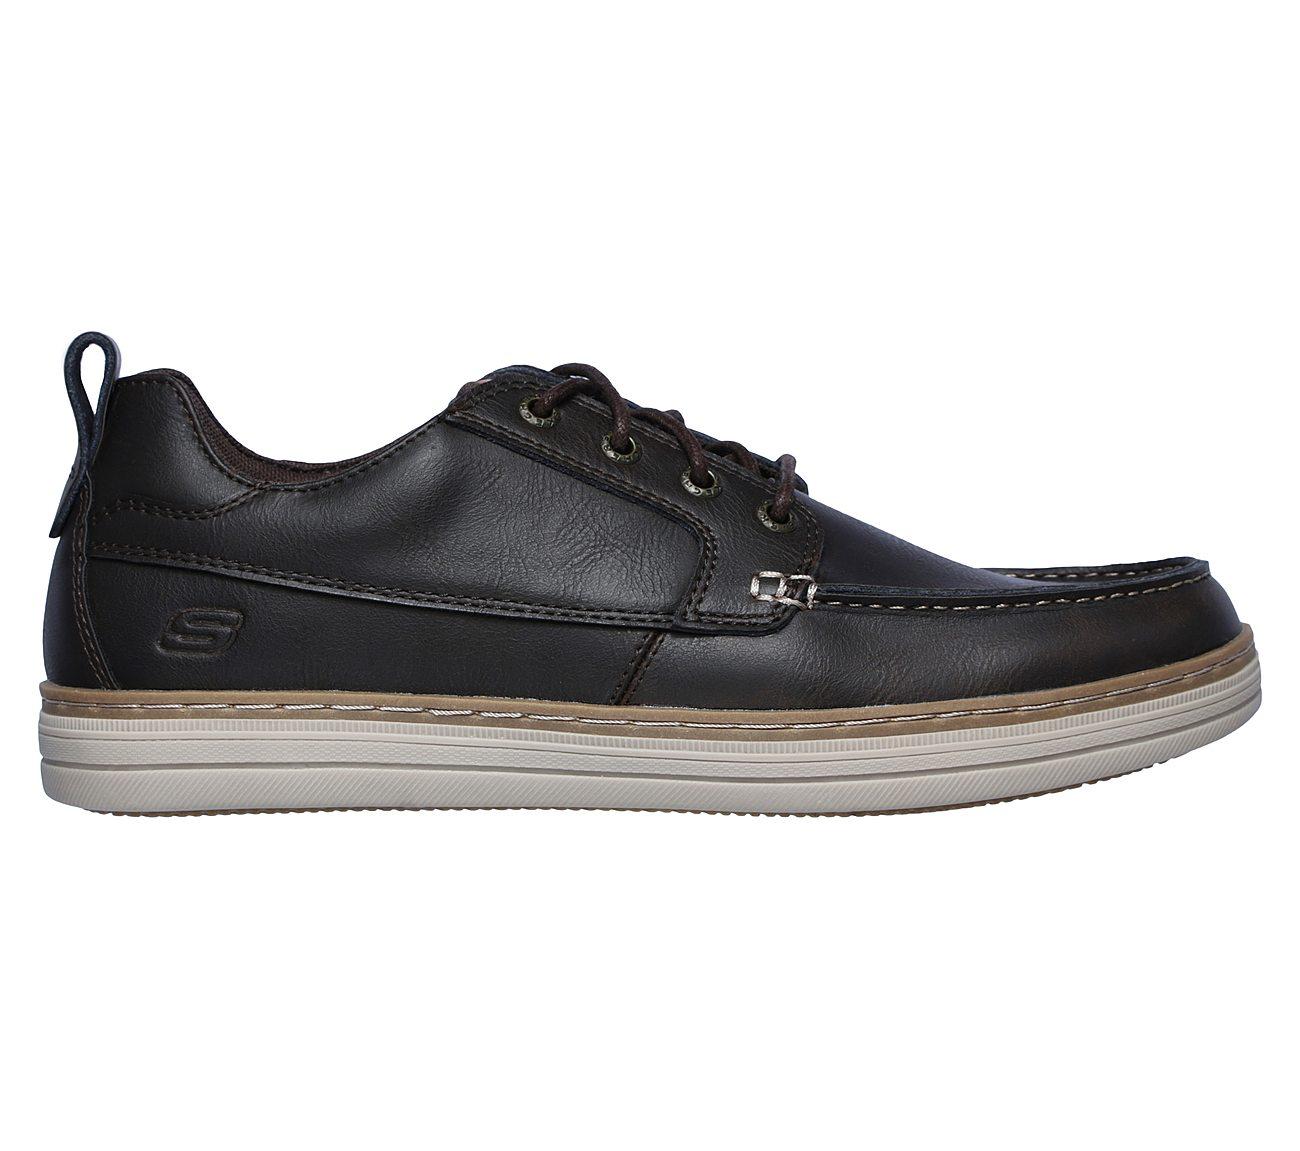 flaco surco Superior  Buy SKECHERS Heston - Sendo SKECHERS USA Shoes